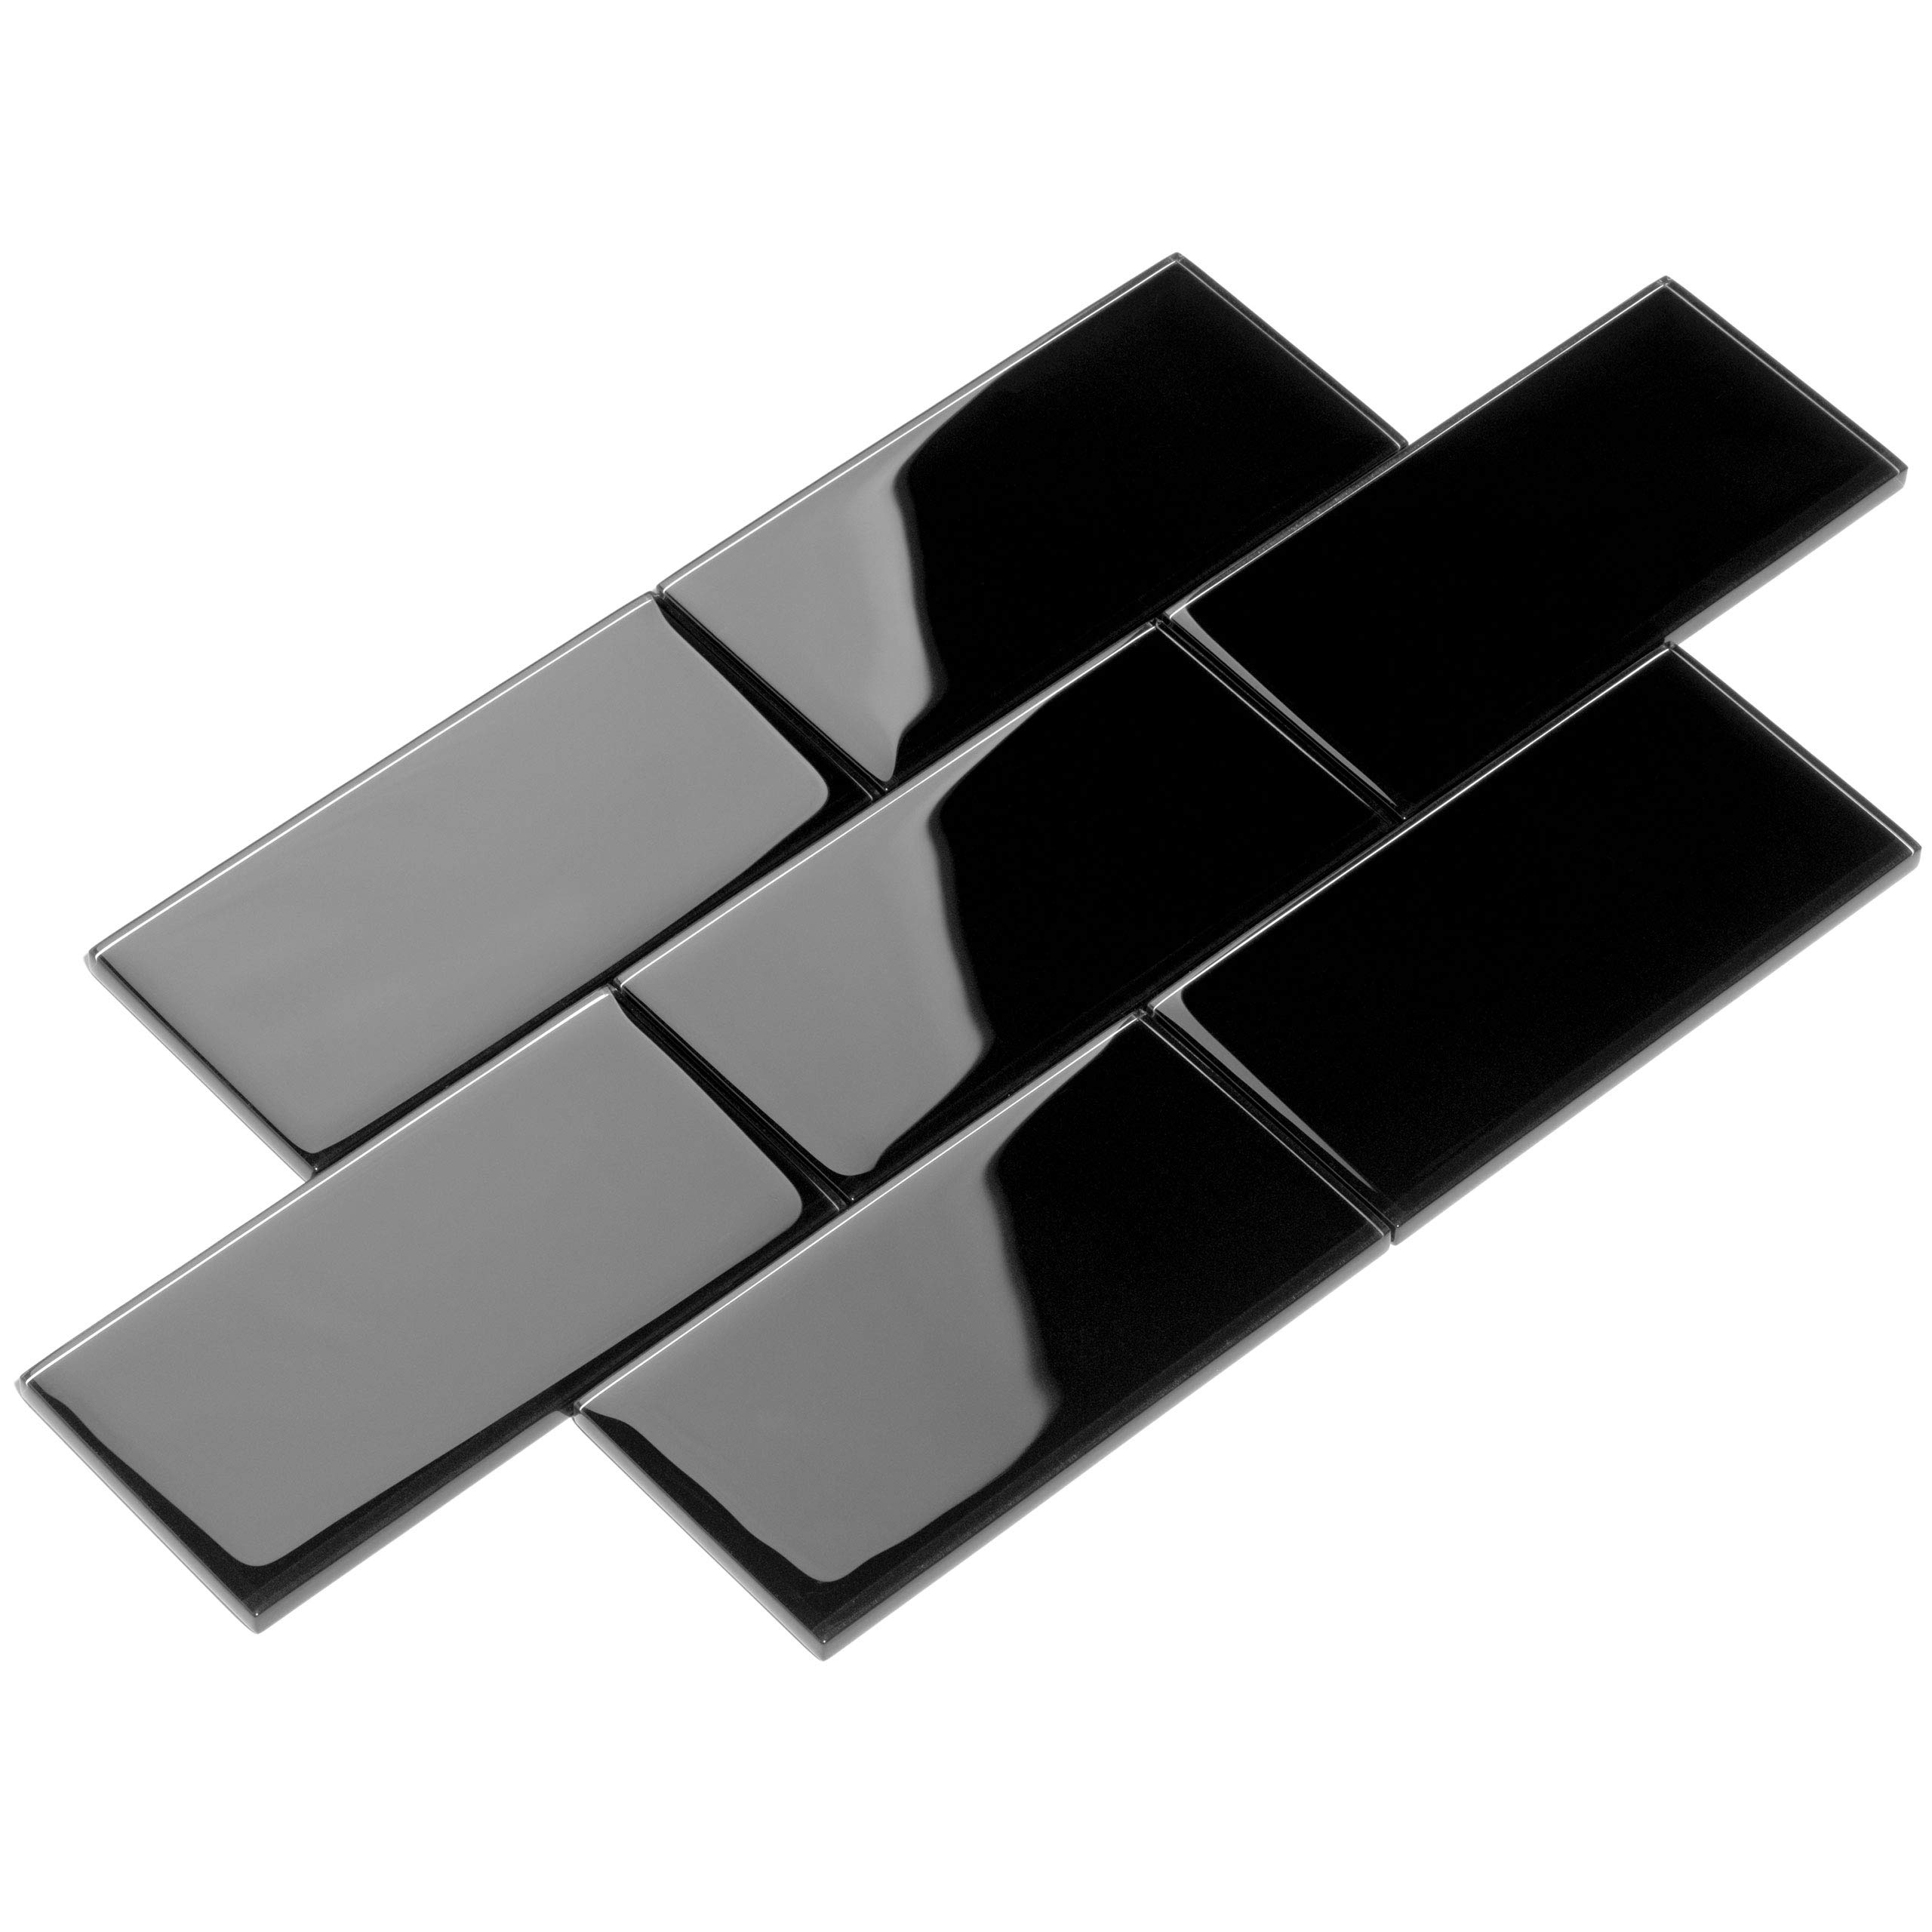 Giorbello Glass Subway Backsplash Tile, 3 x 6, Black, 2 Sq Ft by Giorbello